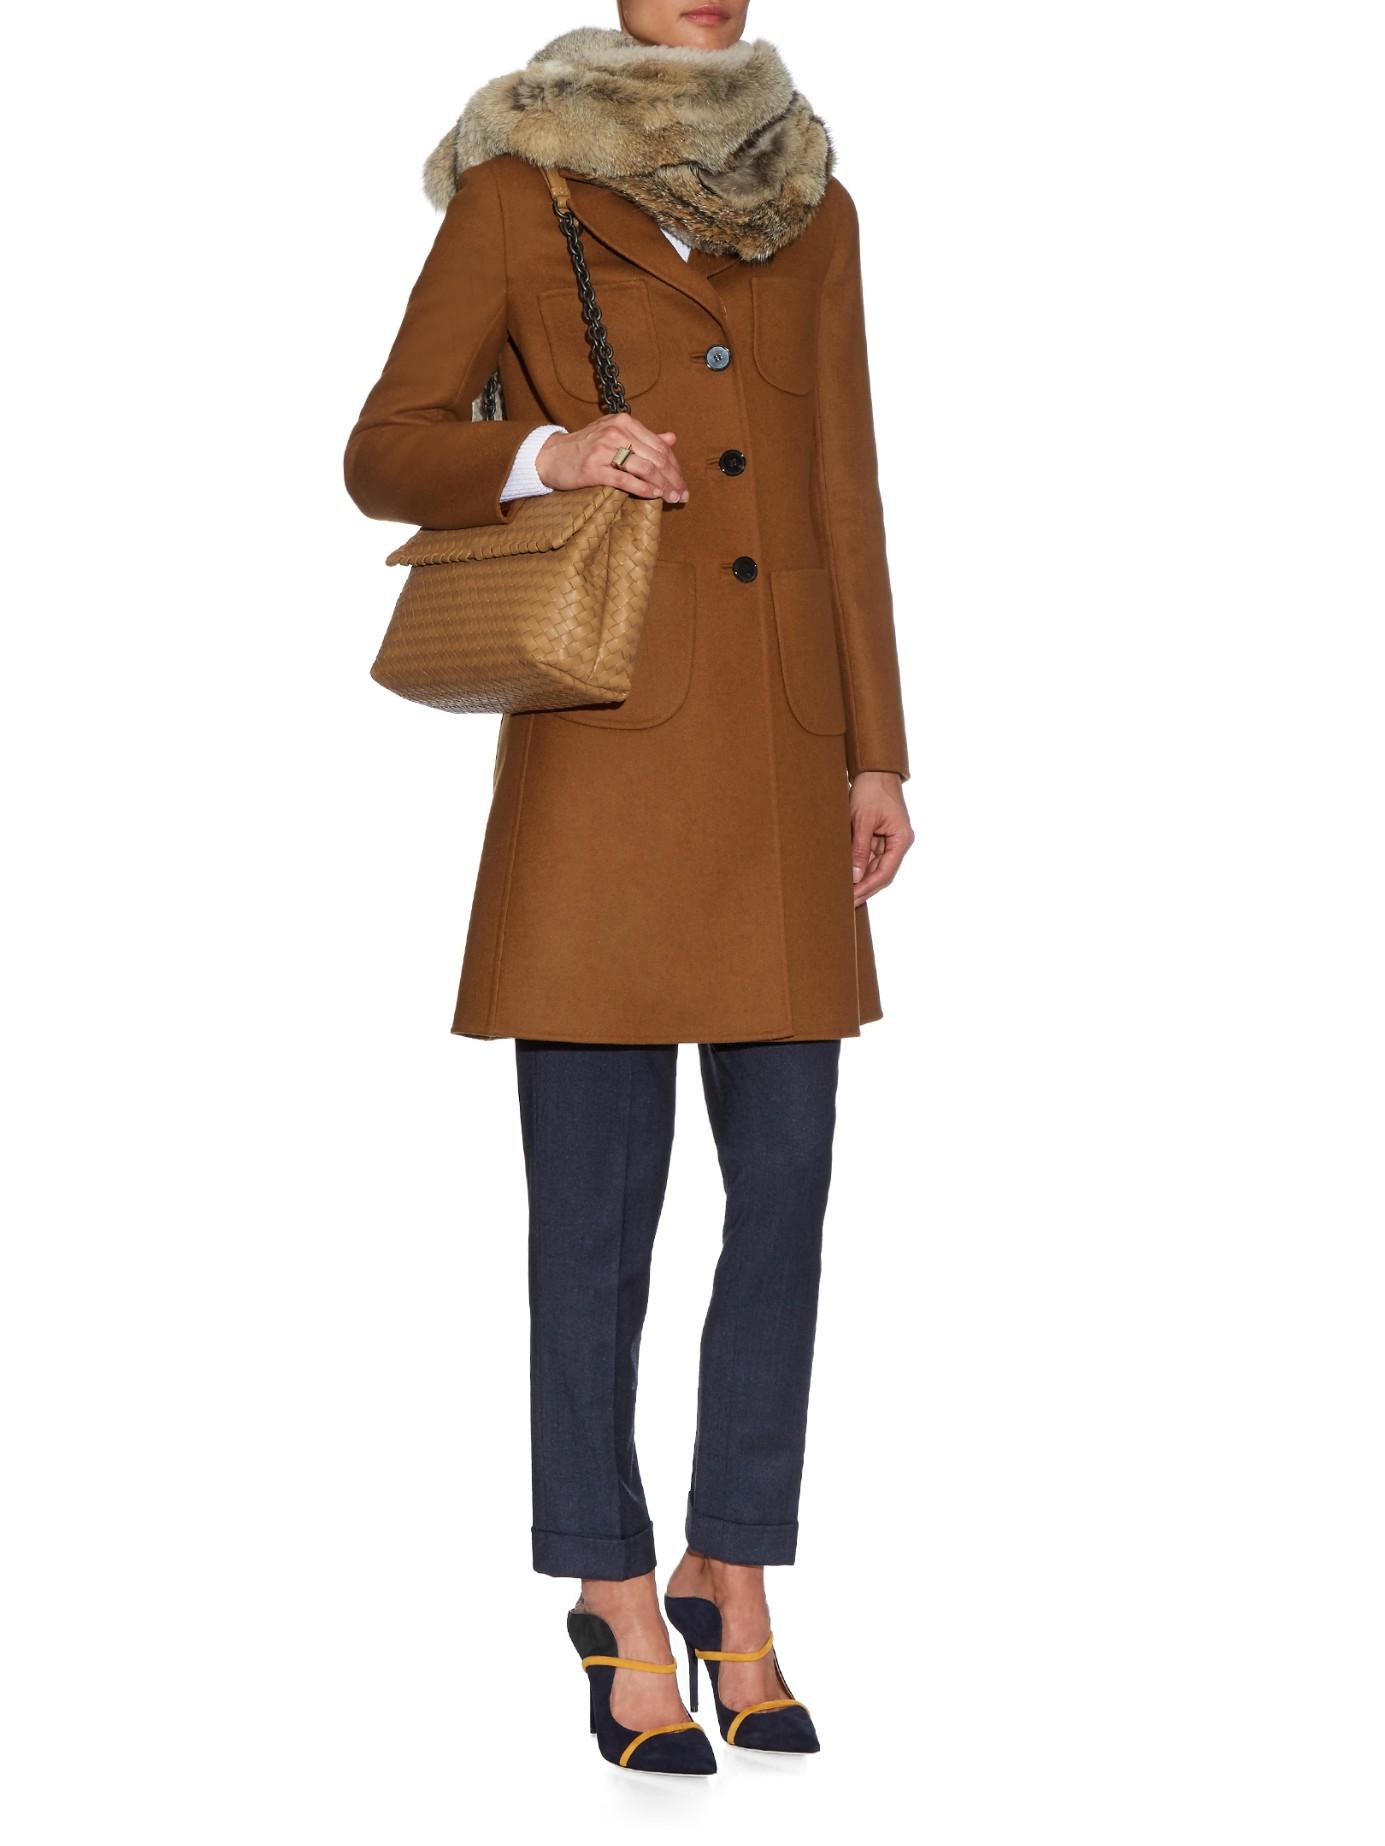 2b40f8f327 Bottega Veneta Olimpia Intrecciato Leather Shoulder Bag in Natural ...